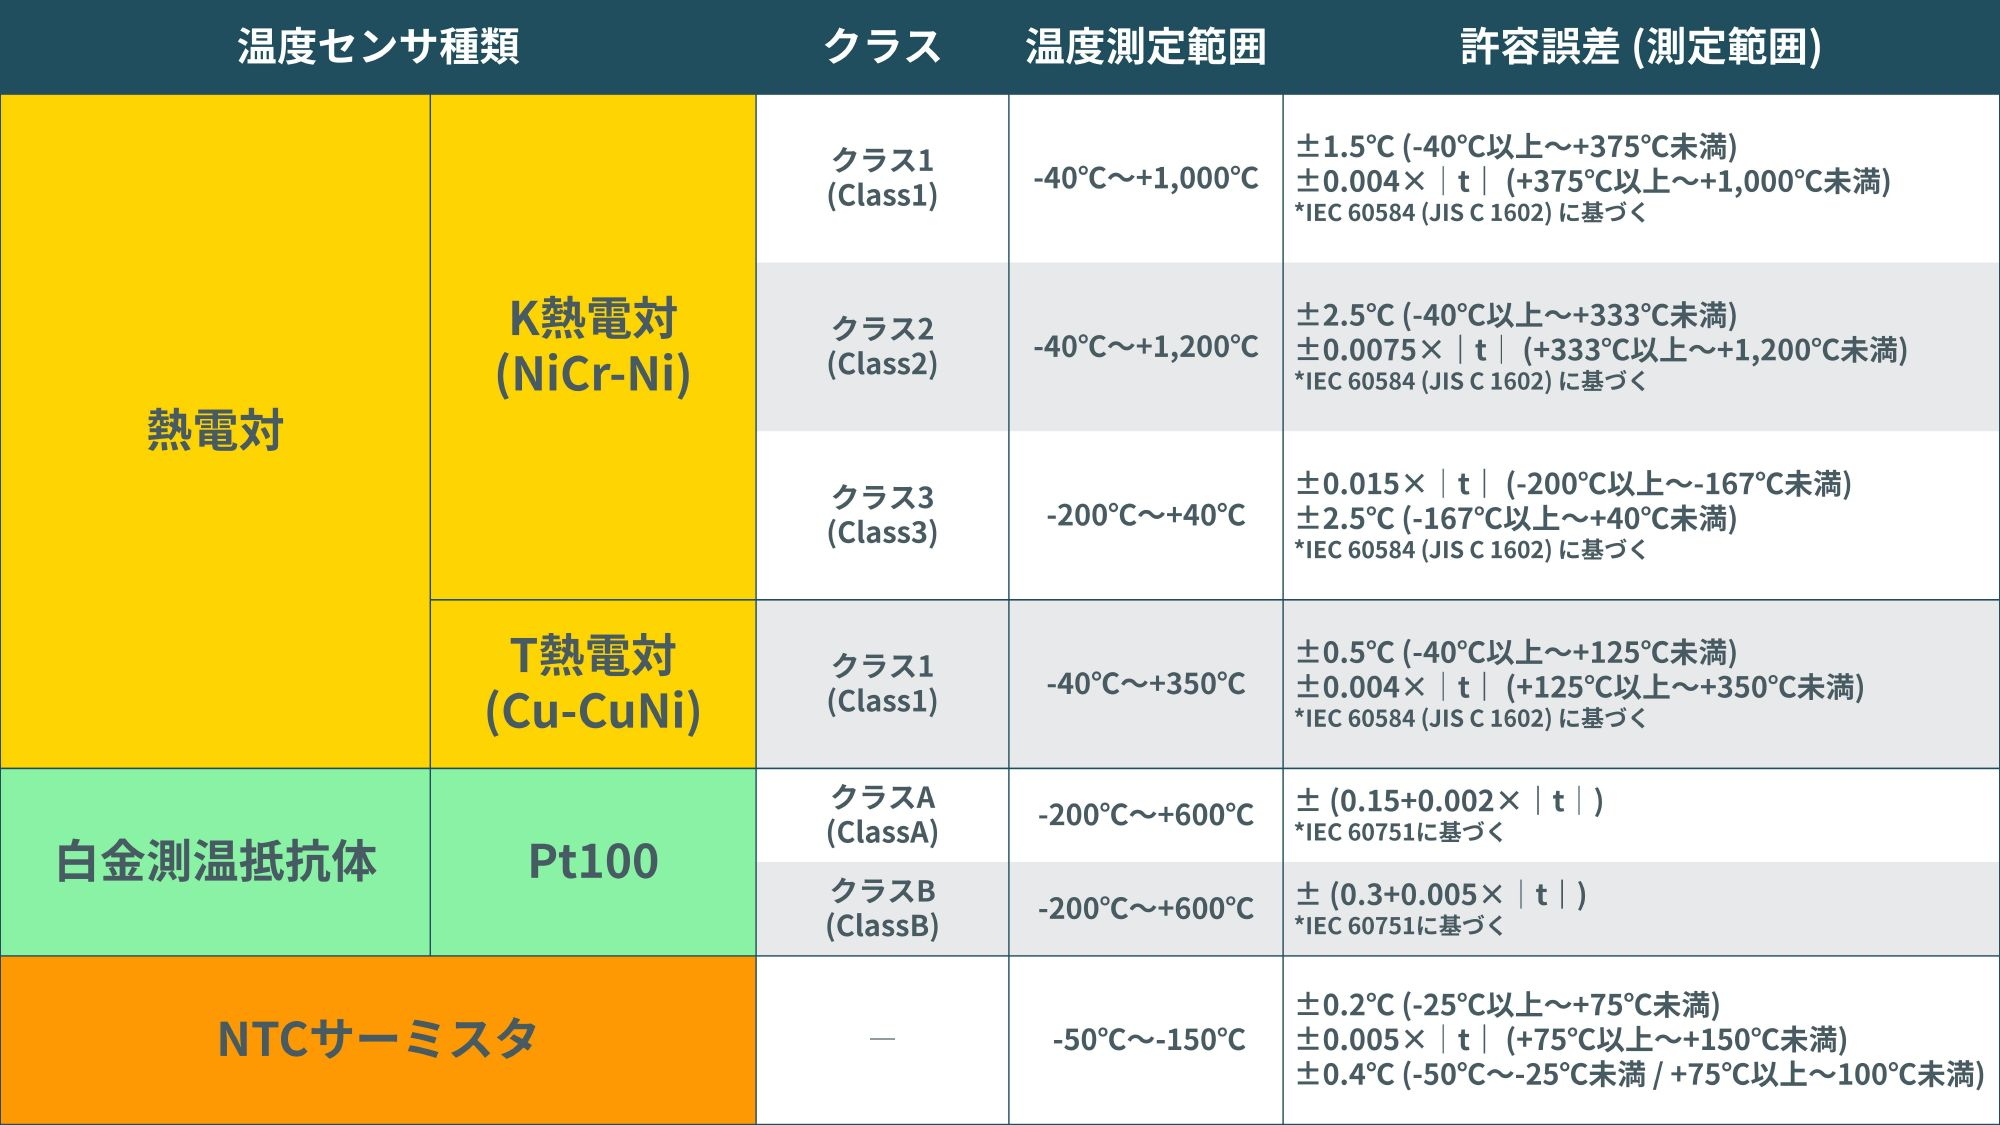 jp_temperature sensor type and accuracy table-2.jpg